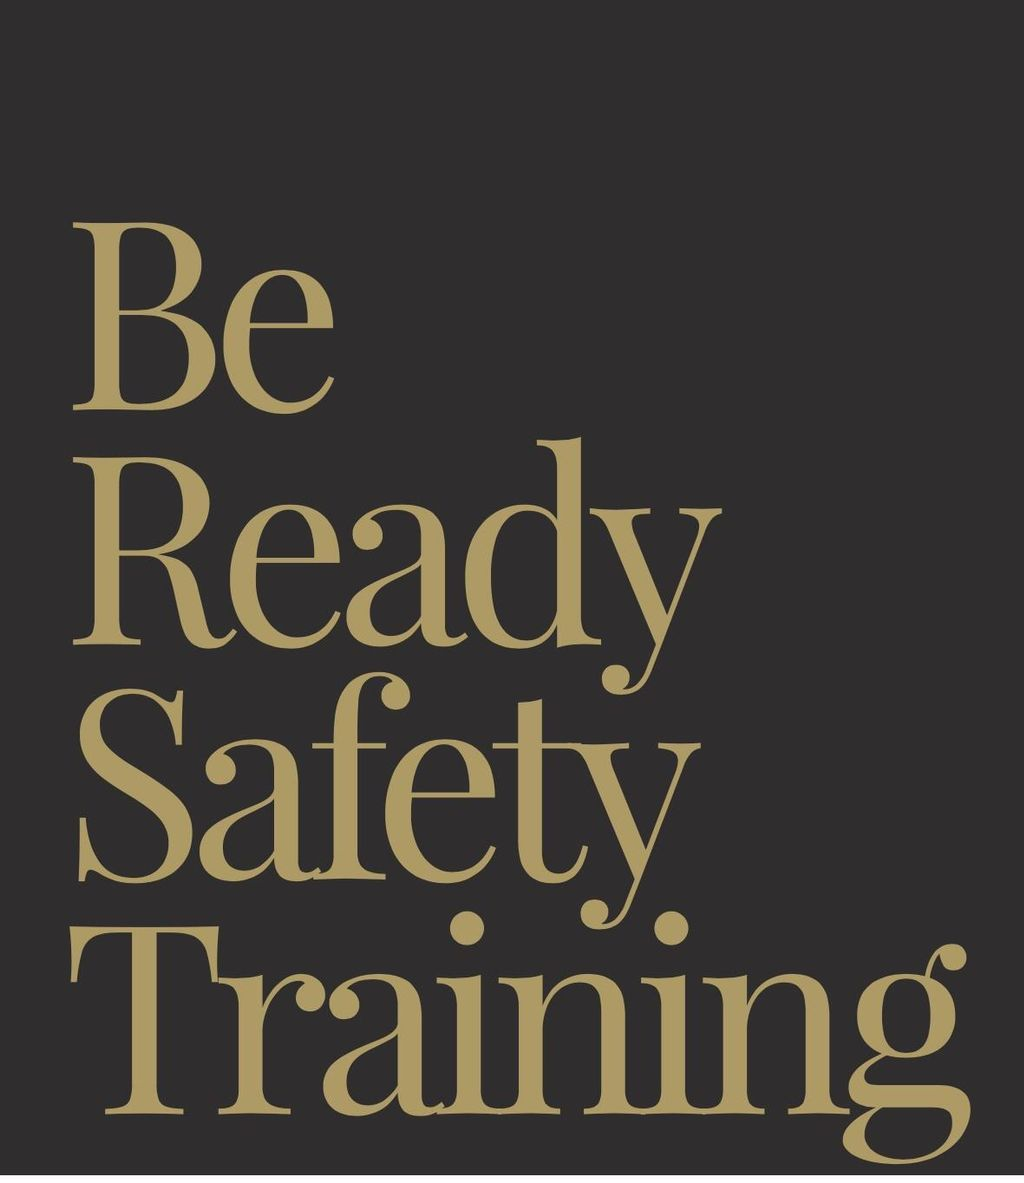 Be Ready-Training